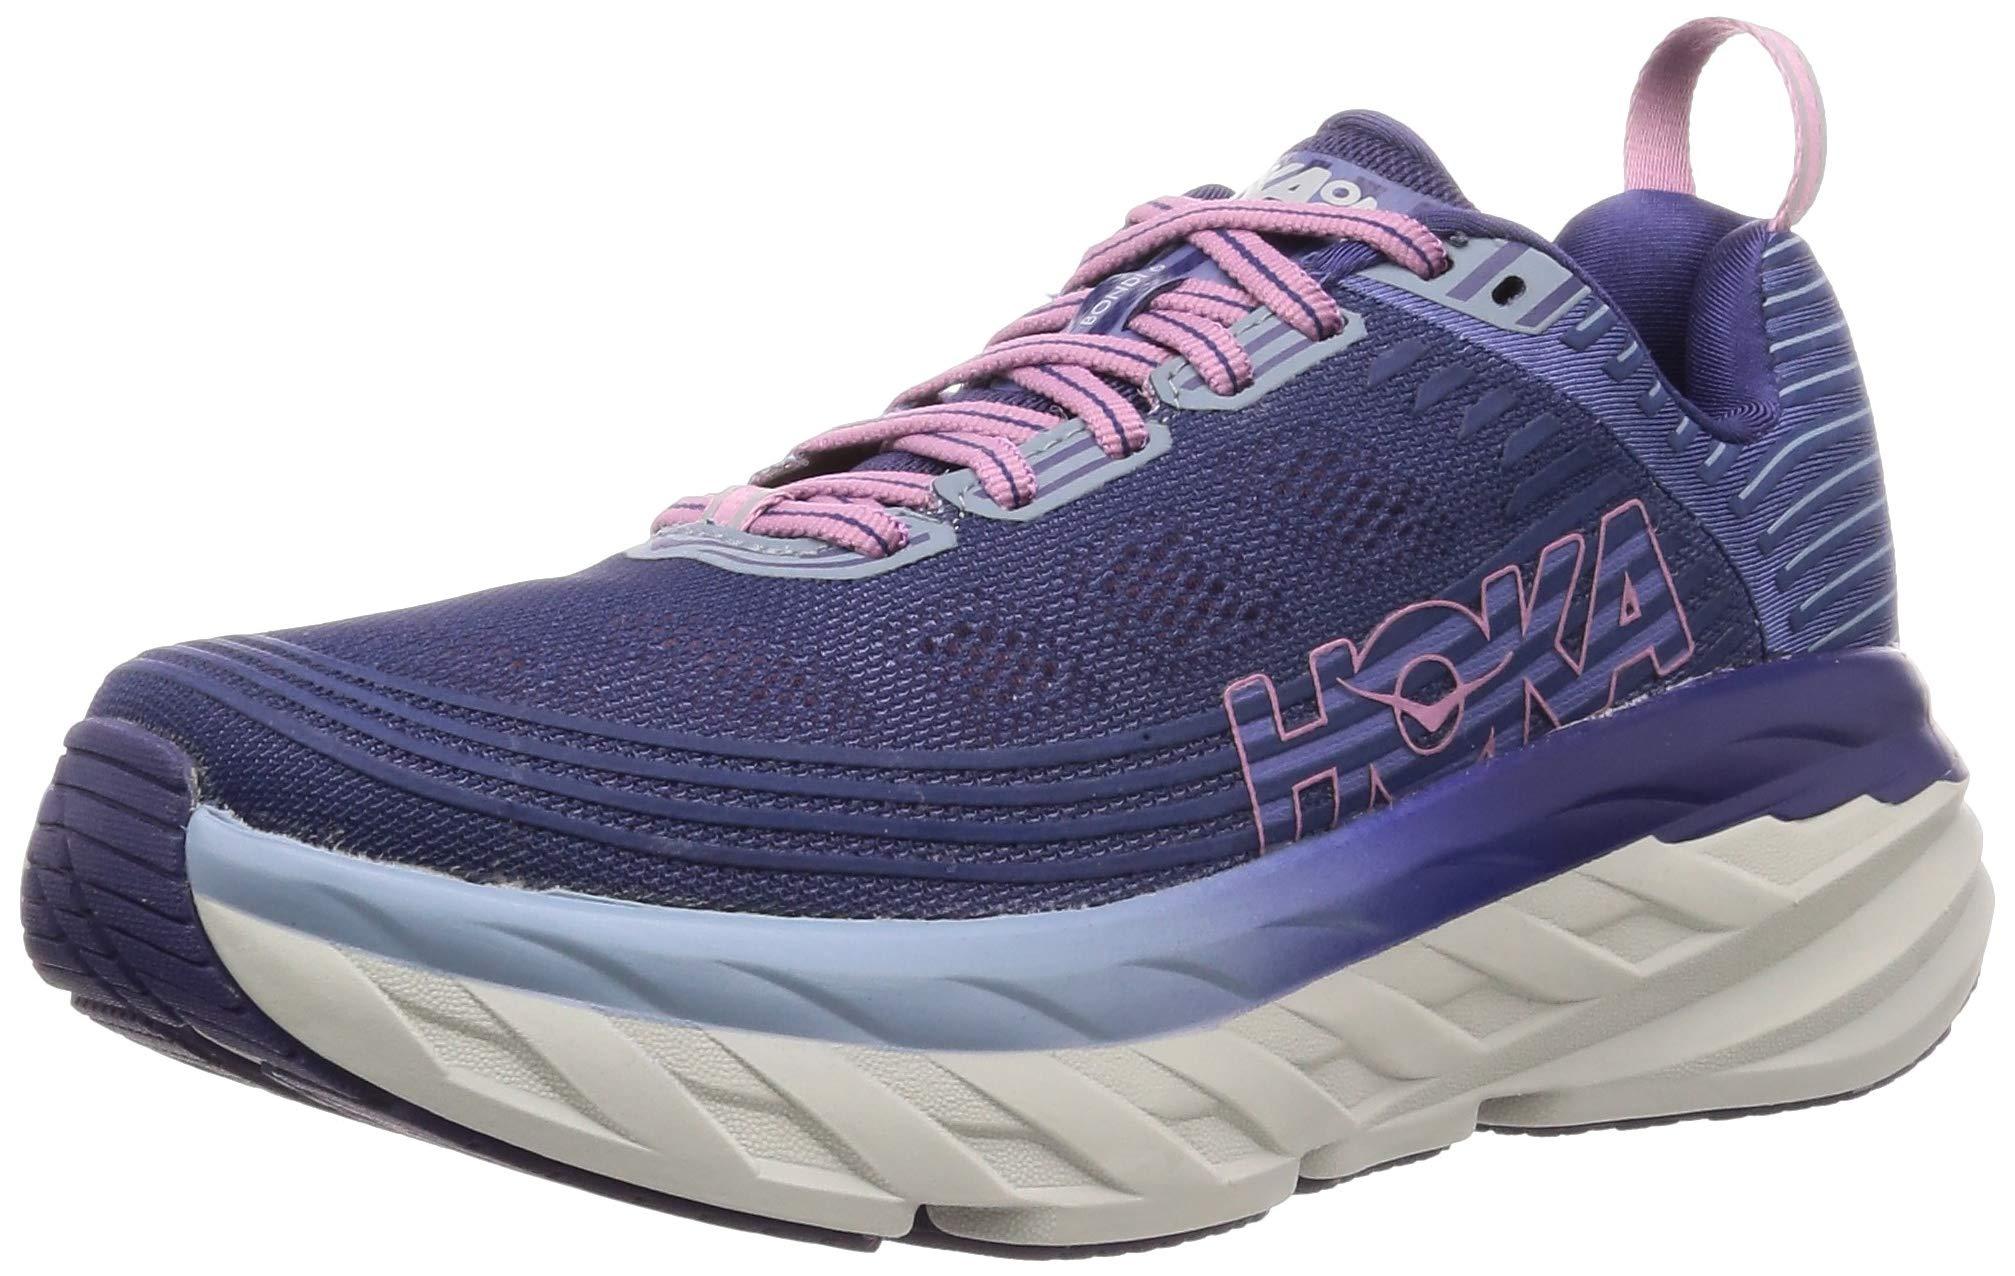 HOKA ONE ONE Womens Bondi 6 Marlin/Blue Ribbon Running Shoe - 6